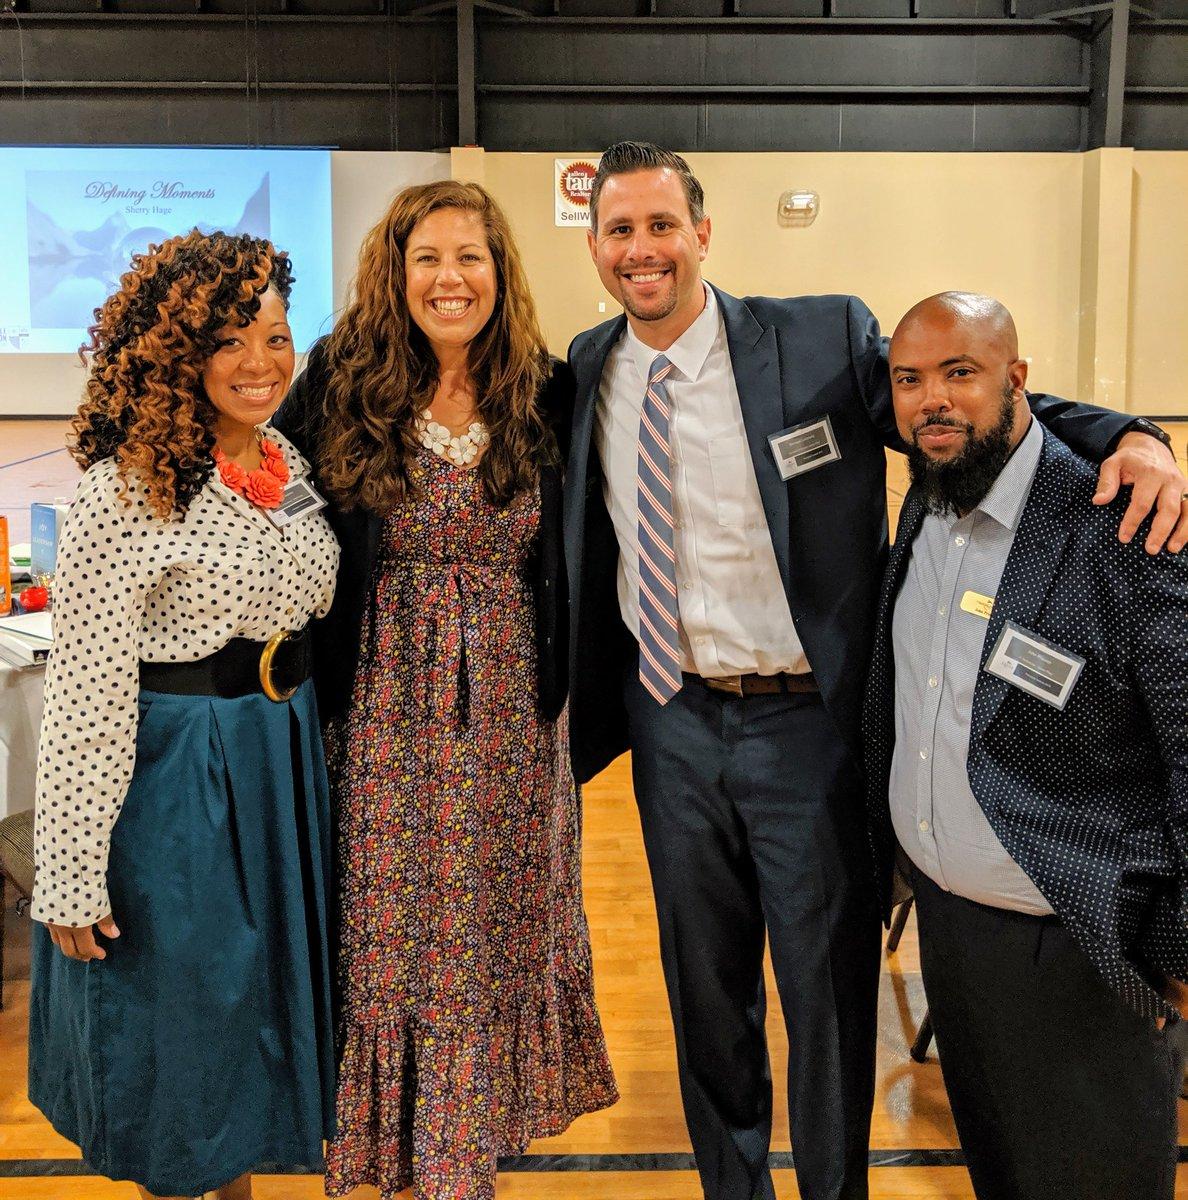 Kicking off Principal's Institute with the best team in North Carolina!  #edleaders #studentsfirst @CSUSAJonHage @NobleEduInit @cnusinov @MrLeibowize @AliBSimpson<br>http://pic.twitter.com/sZXgwMYFdY